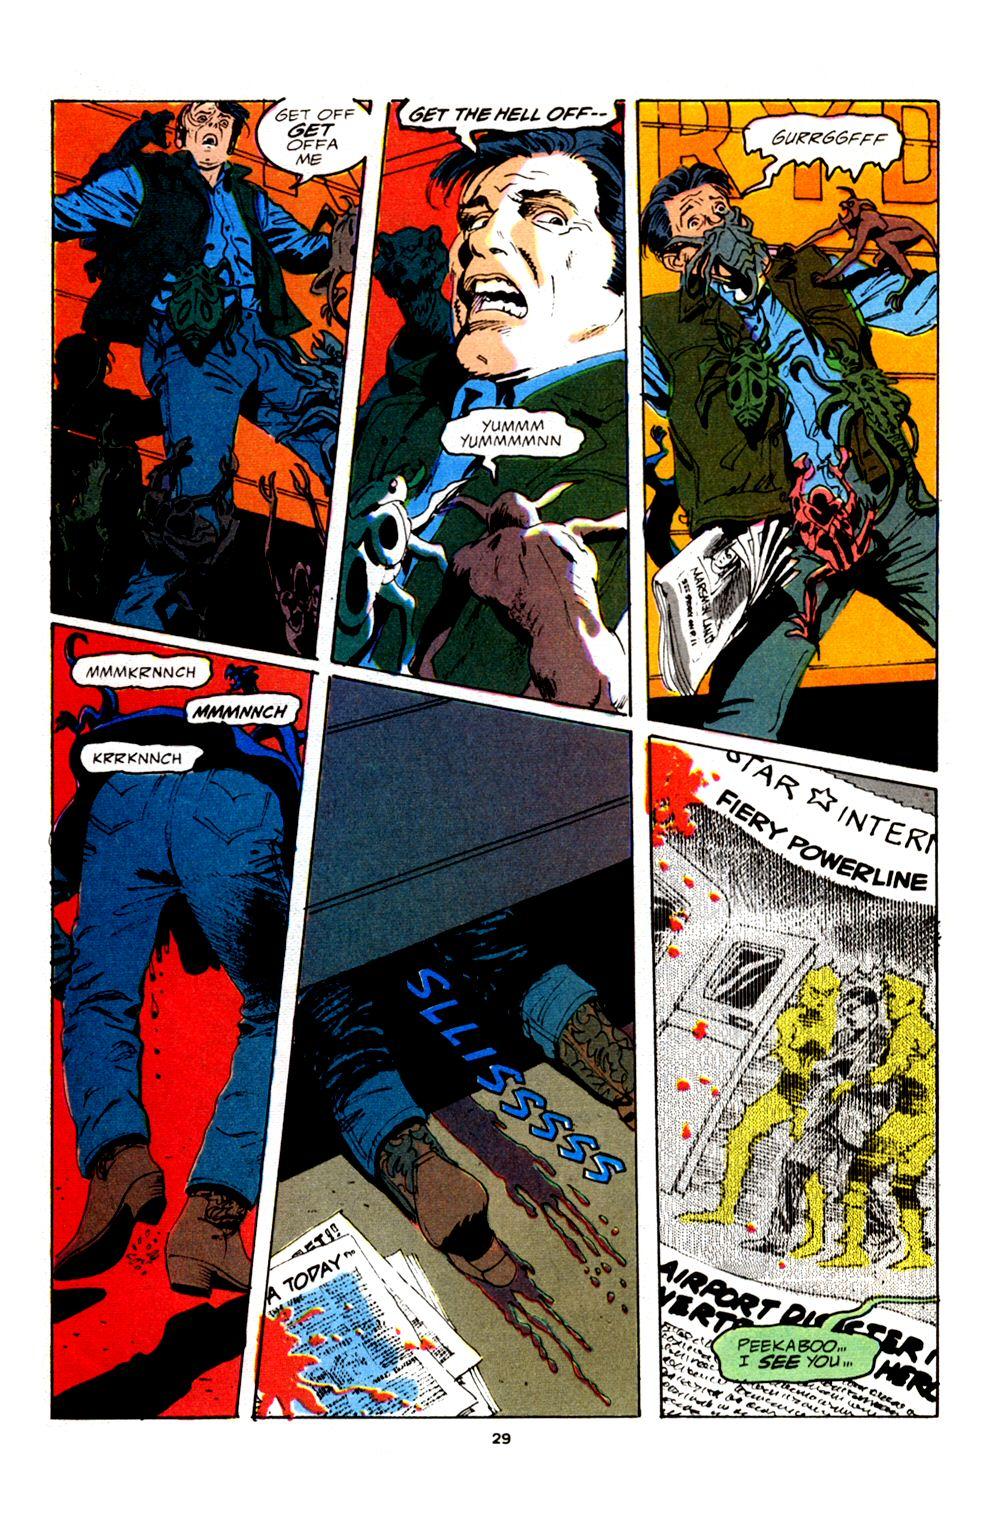 Read online Powerline comic -  Issue #4 - 31